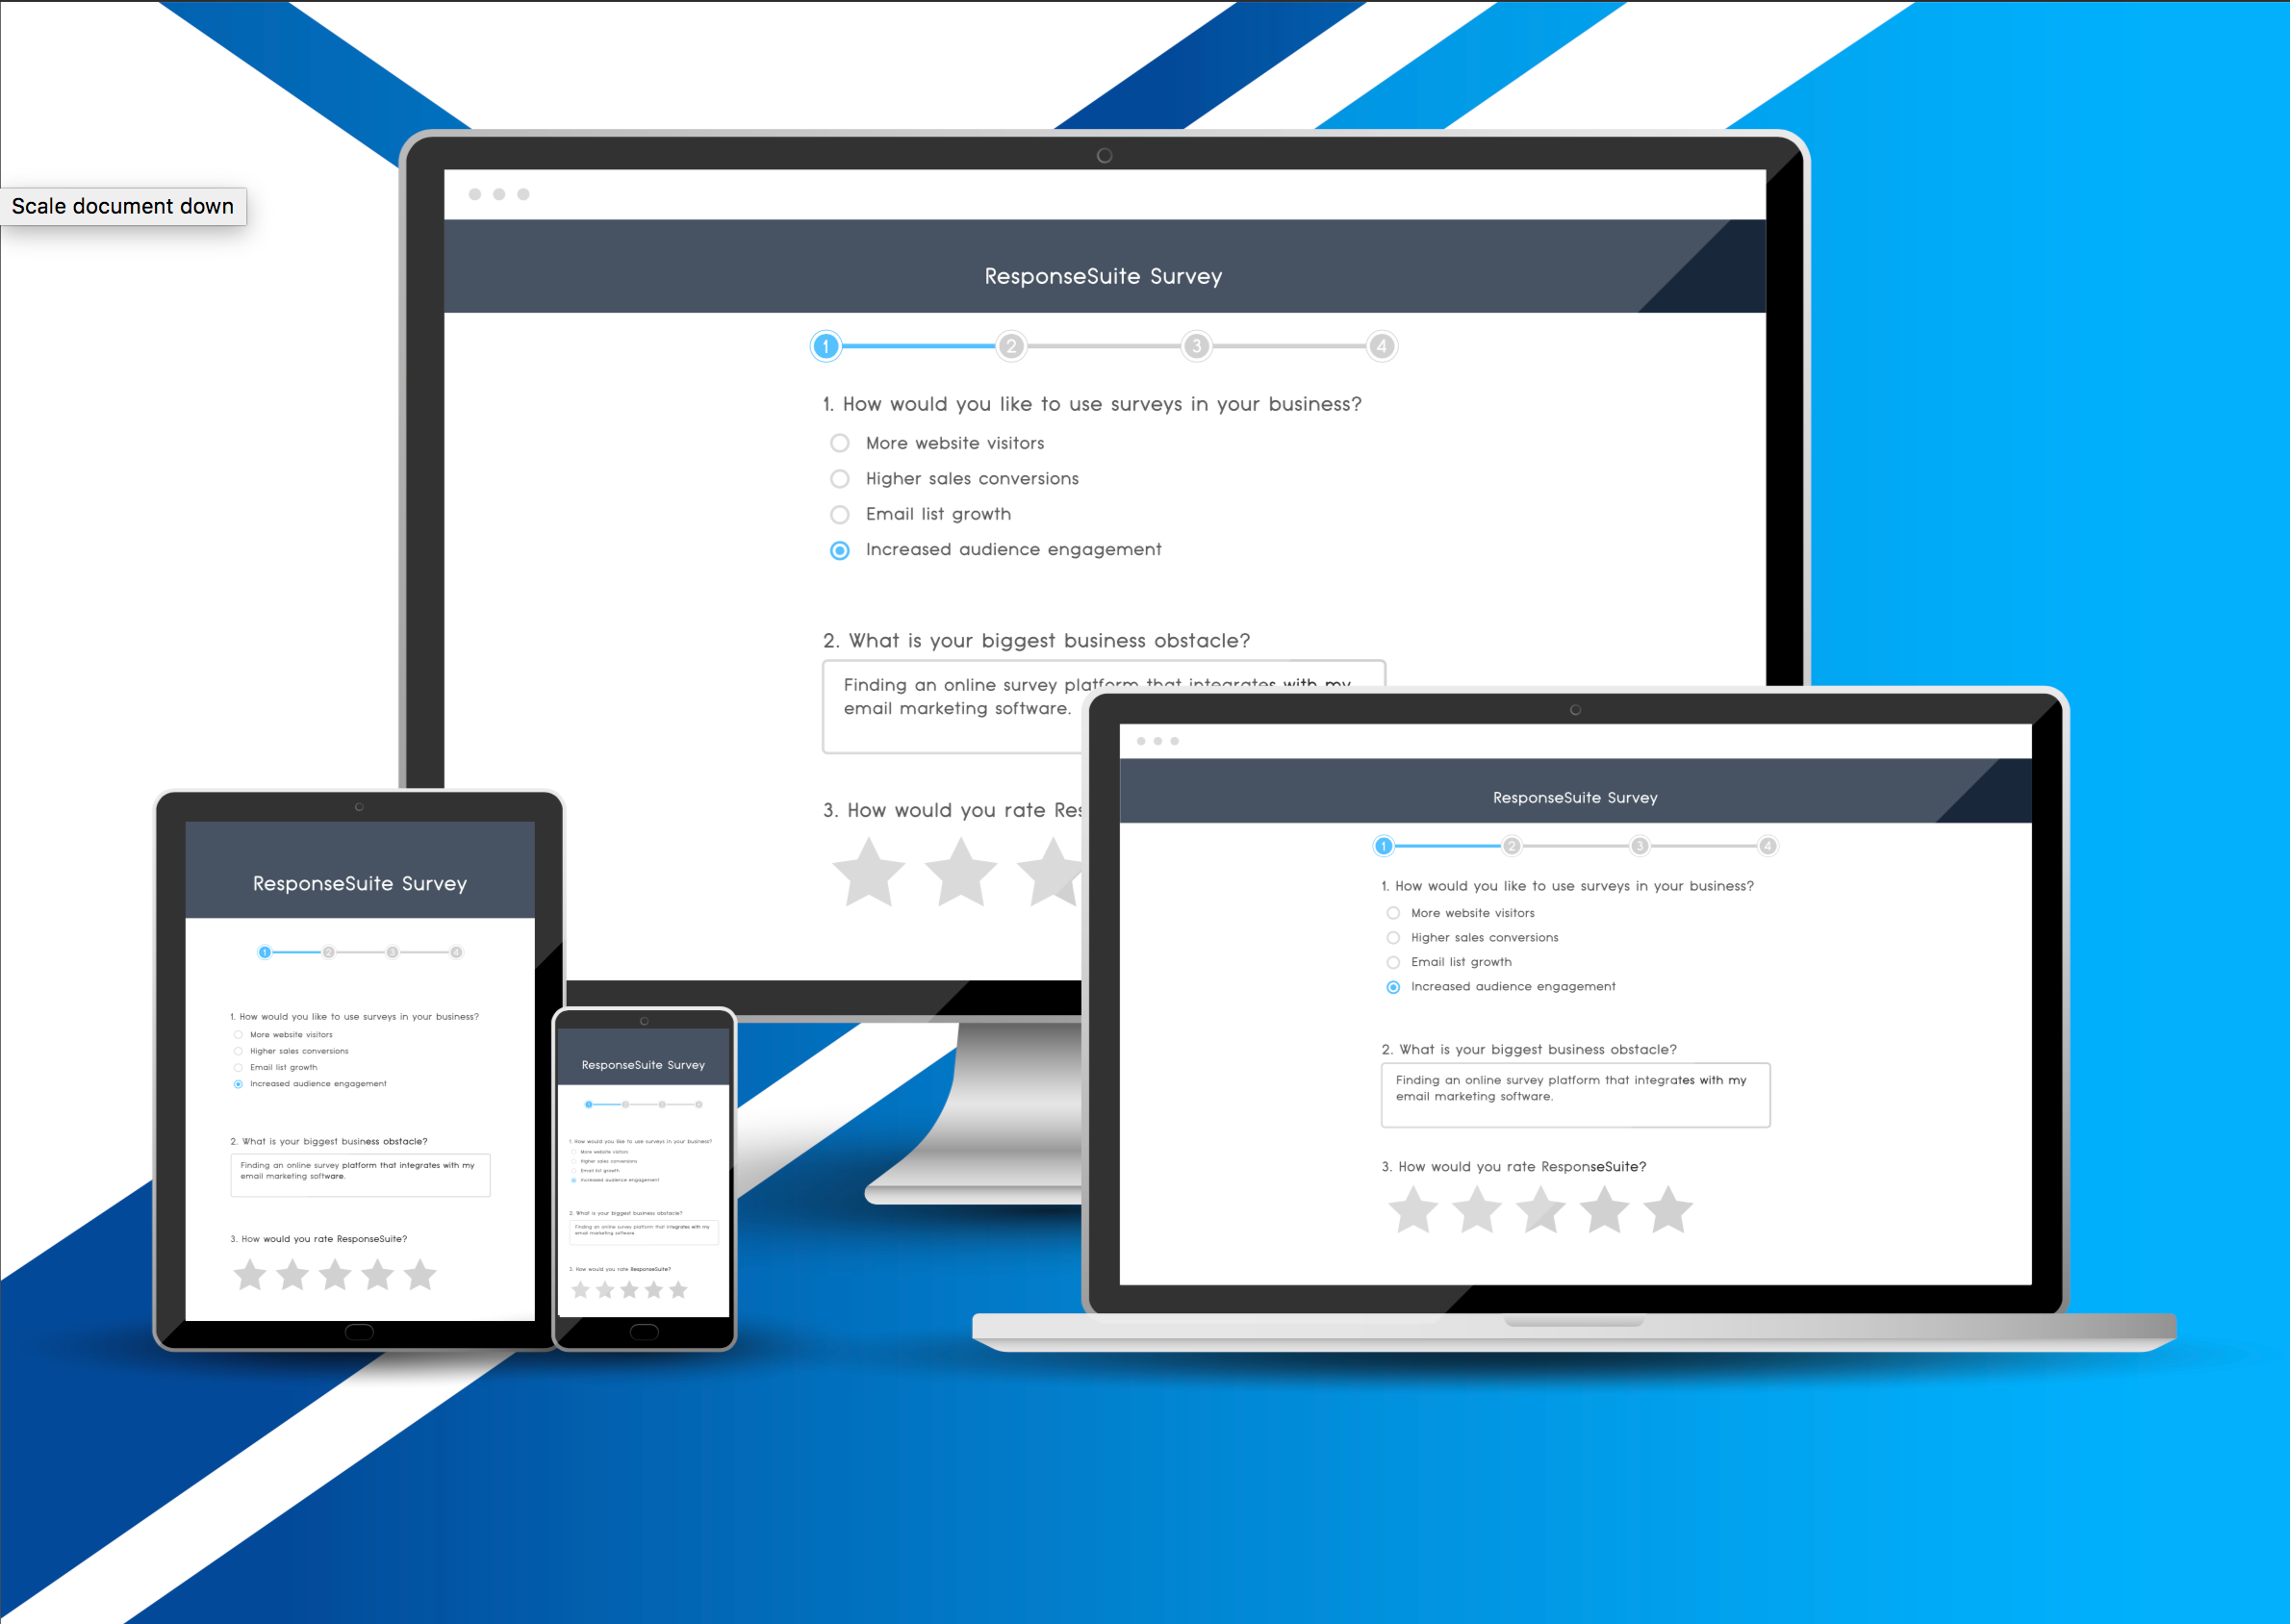 Buy Software Apps - Lifetime Deal ResponseSuite content